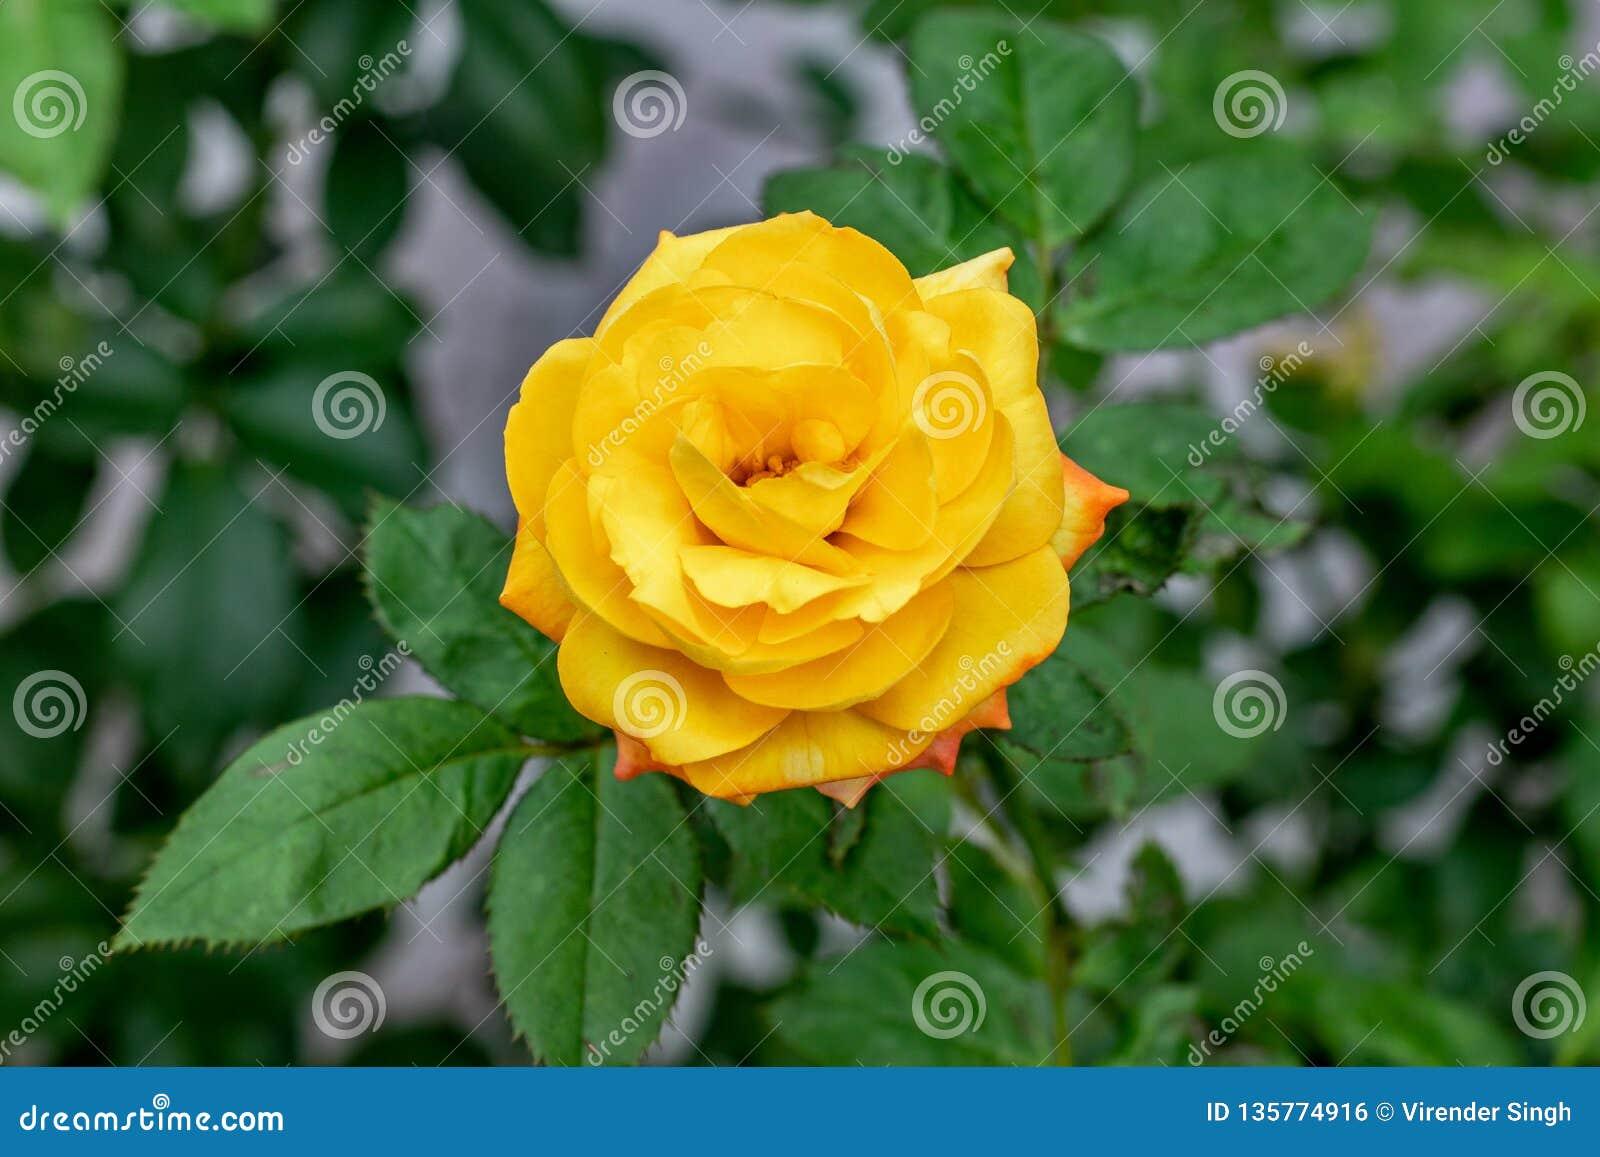 Rose de floraison rose jaune